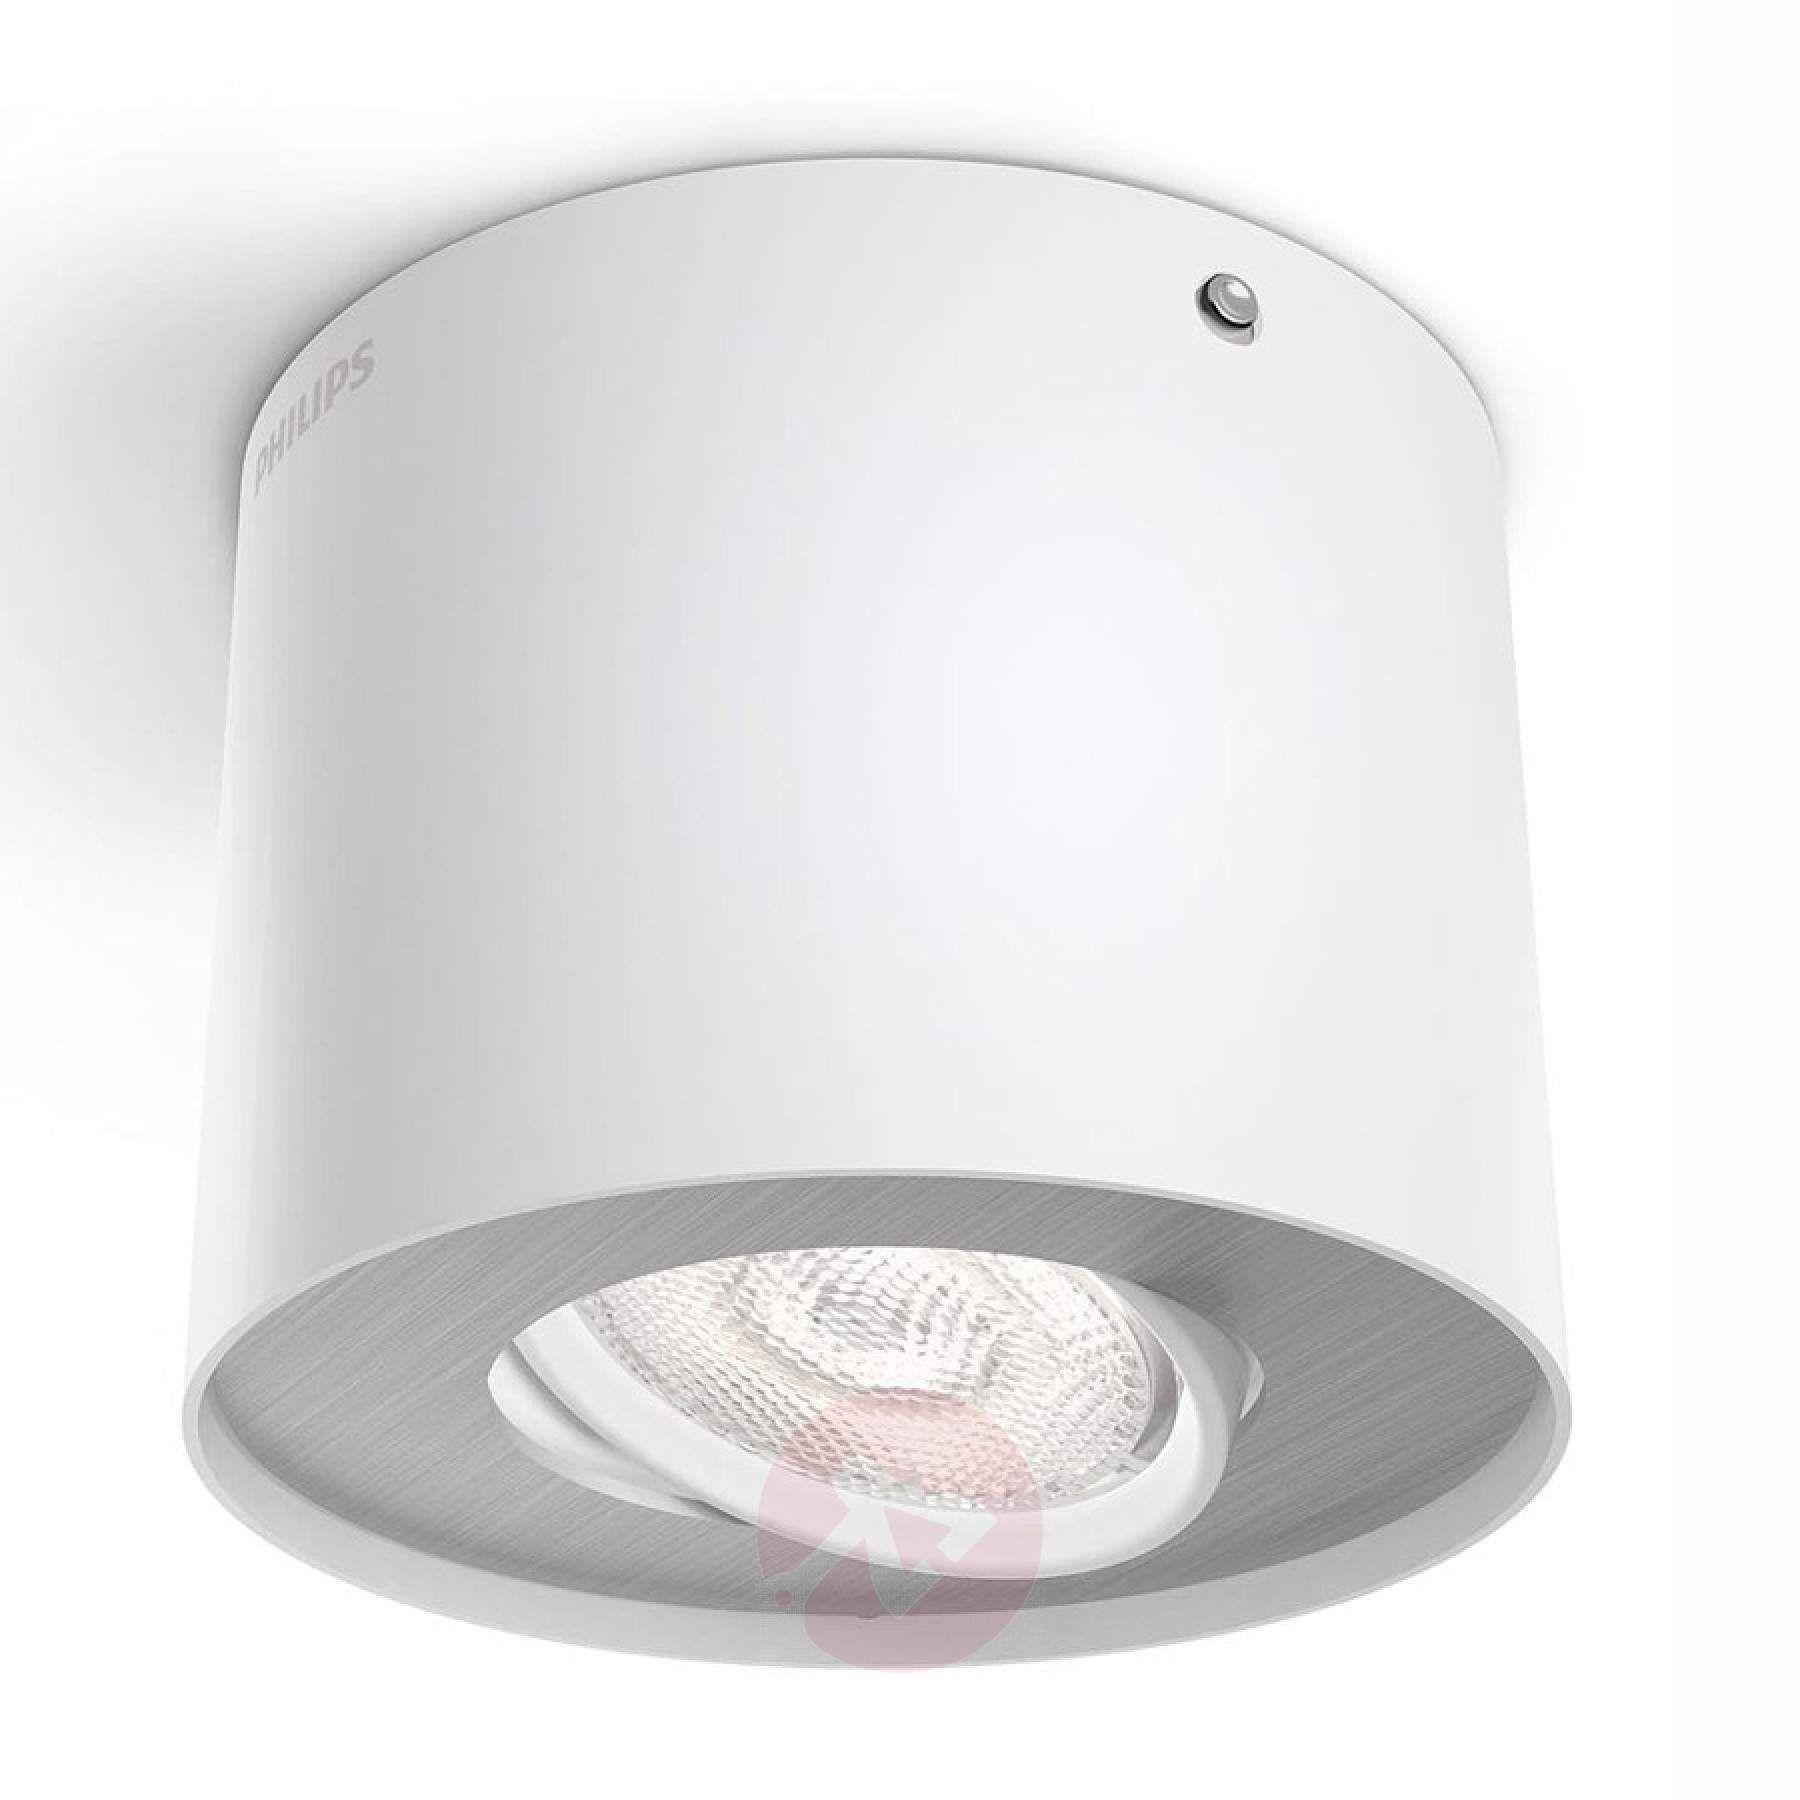 Philips Phase Led Downlight Weiss 1 Flammig Kaufen Lampenwelt De In 2020 Led Deckenstrahler Led Strahler Led